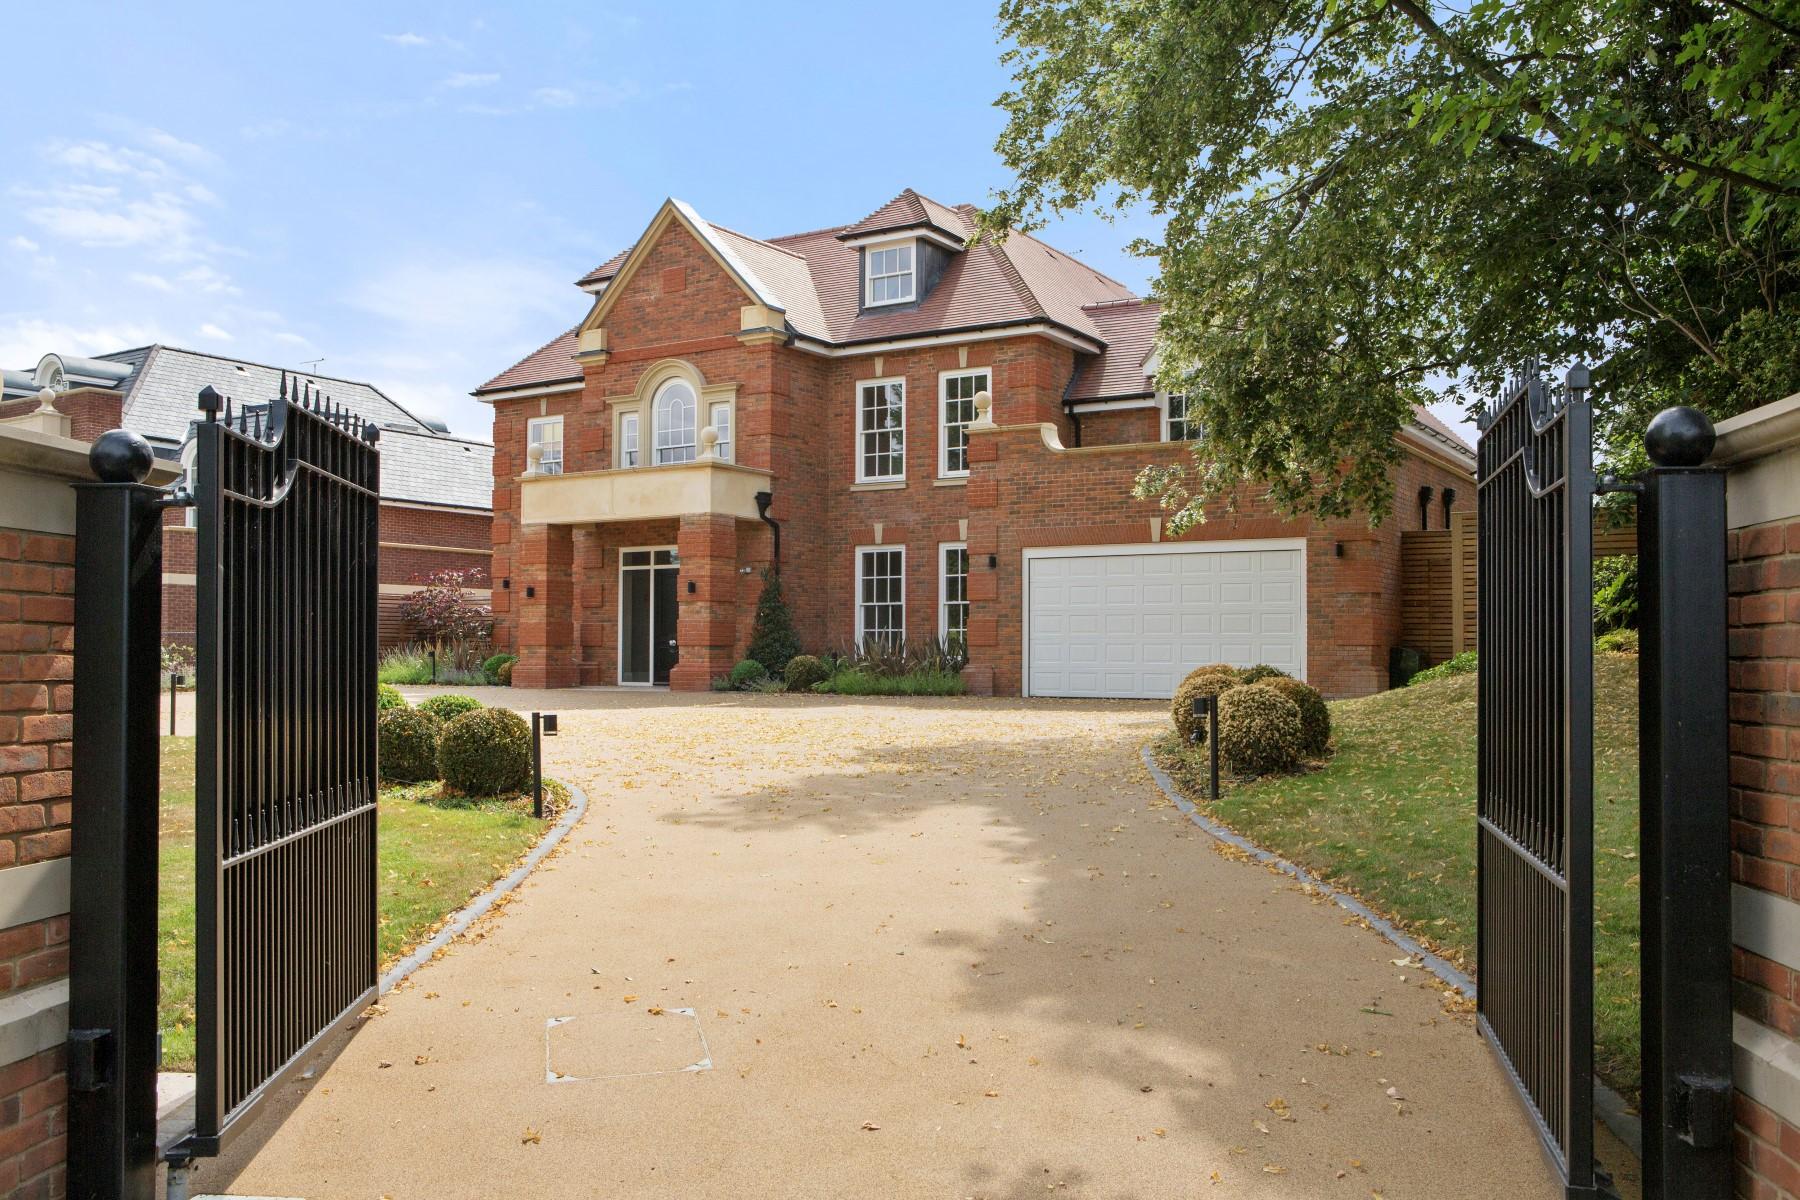 Single Family Home for Sale at Oxshott Birdshill Rise Oxshott Other England, England KT220SW United Kingdom